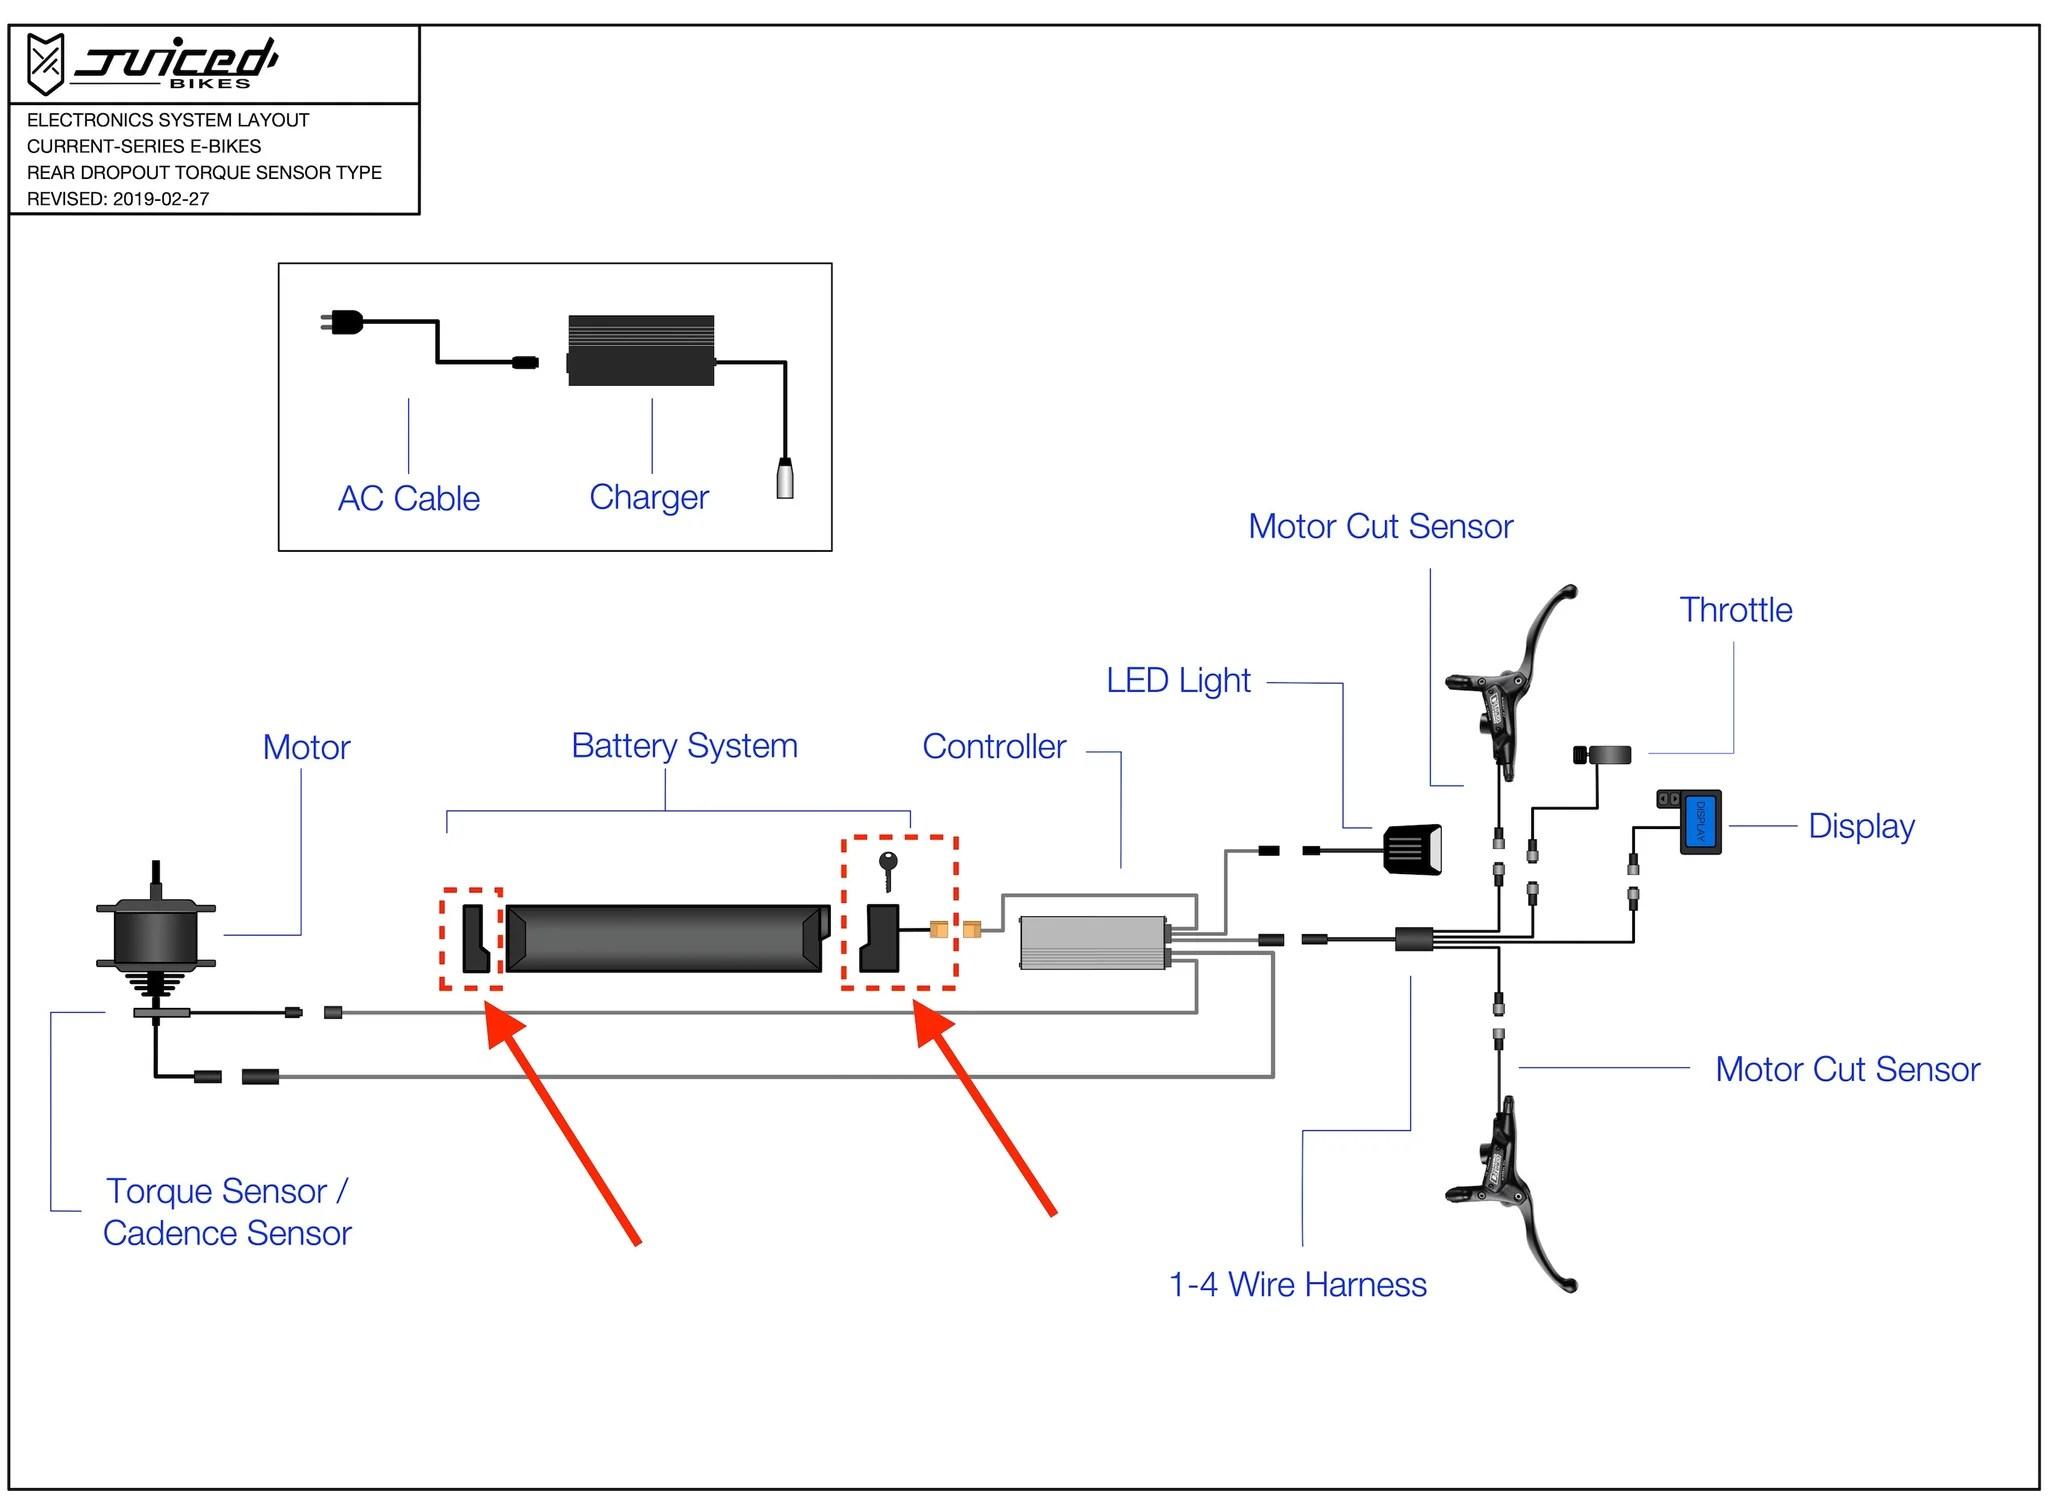 medium resolution of electronics layout